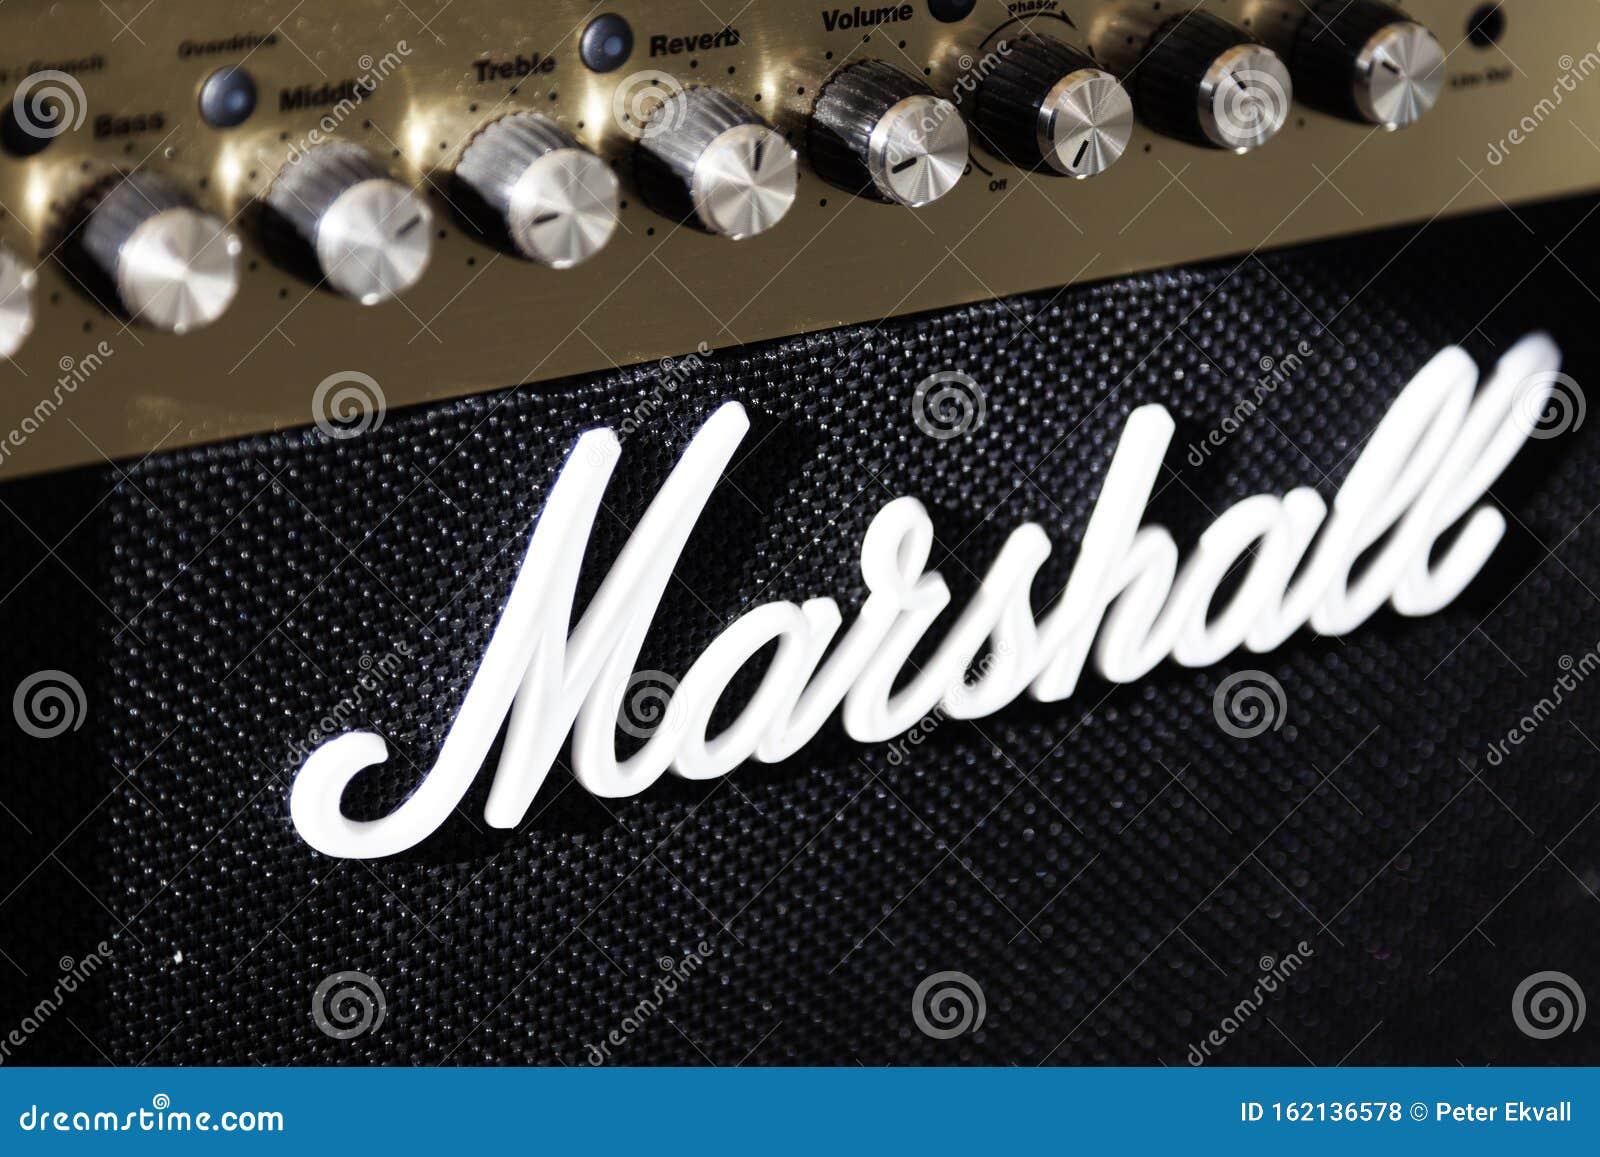 20 Amplifier Marshall Photos   Free & Royalty Free Stock Photos ...